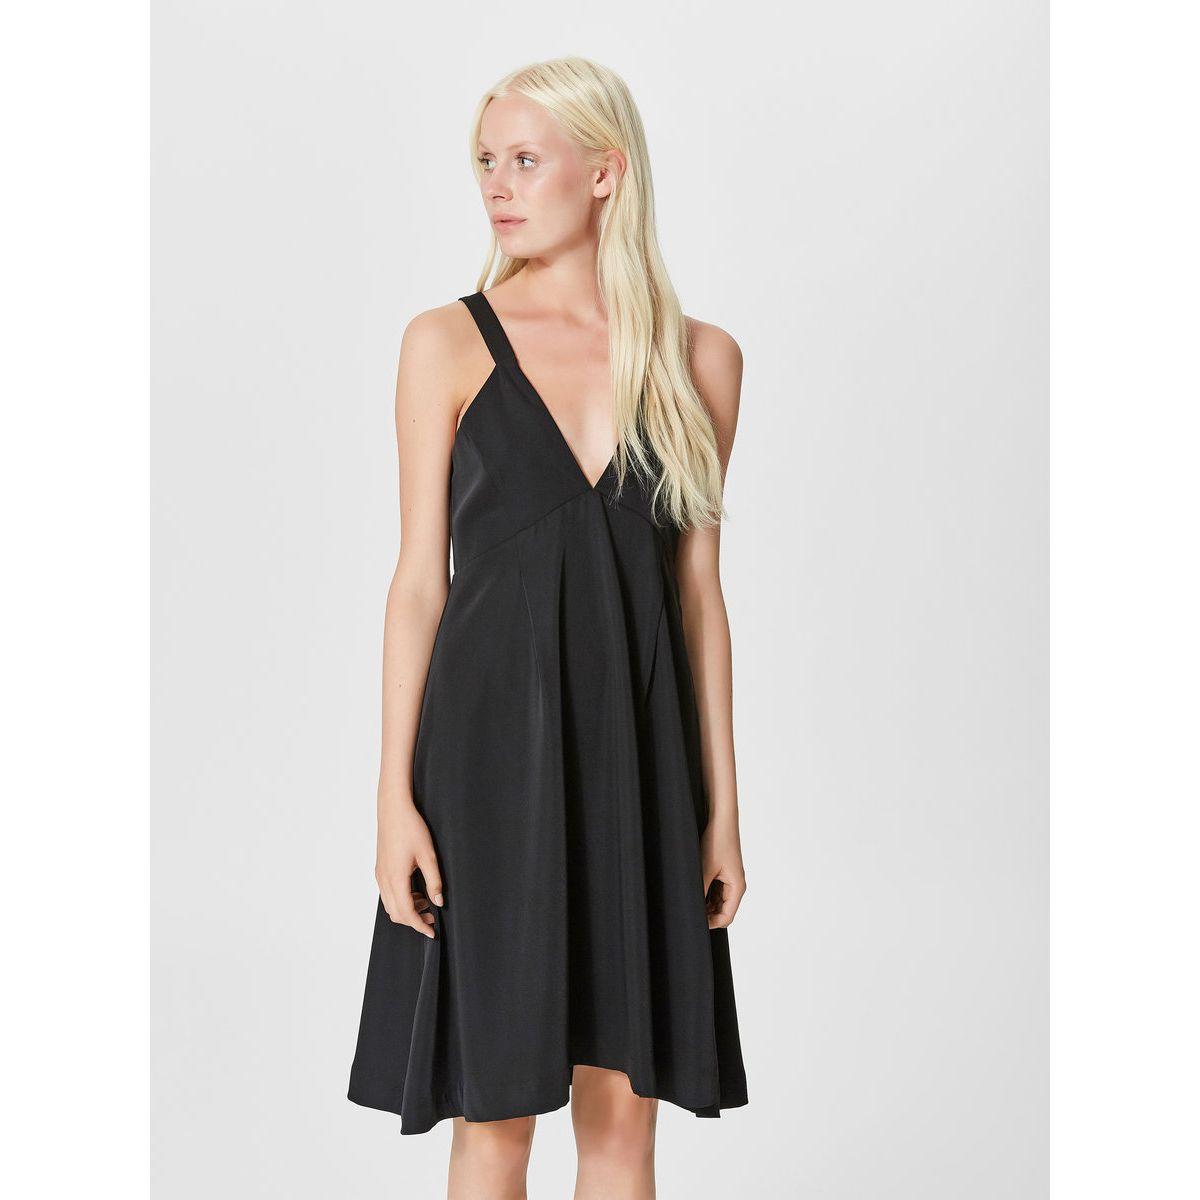 Selected Femme Party Kleid ohne Ärmel